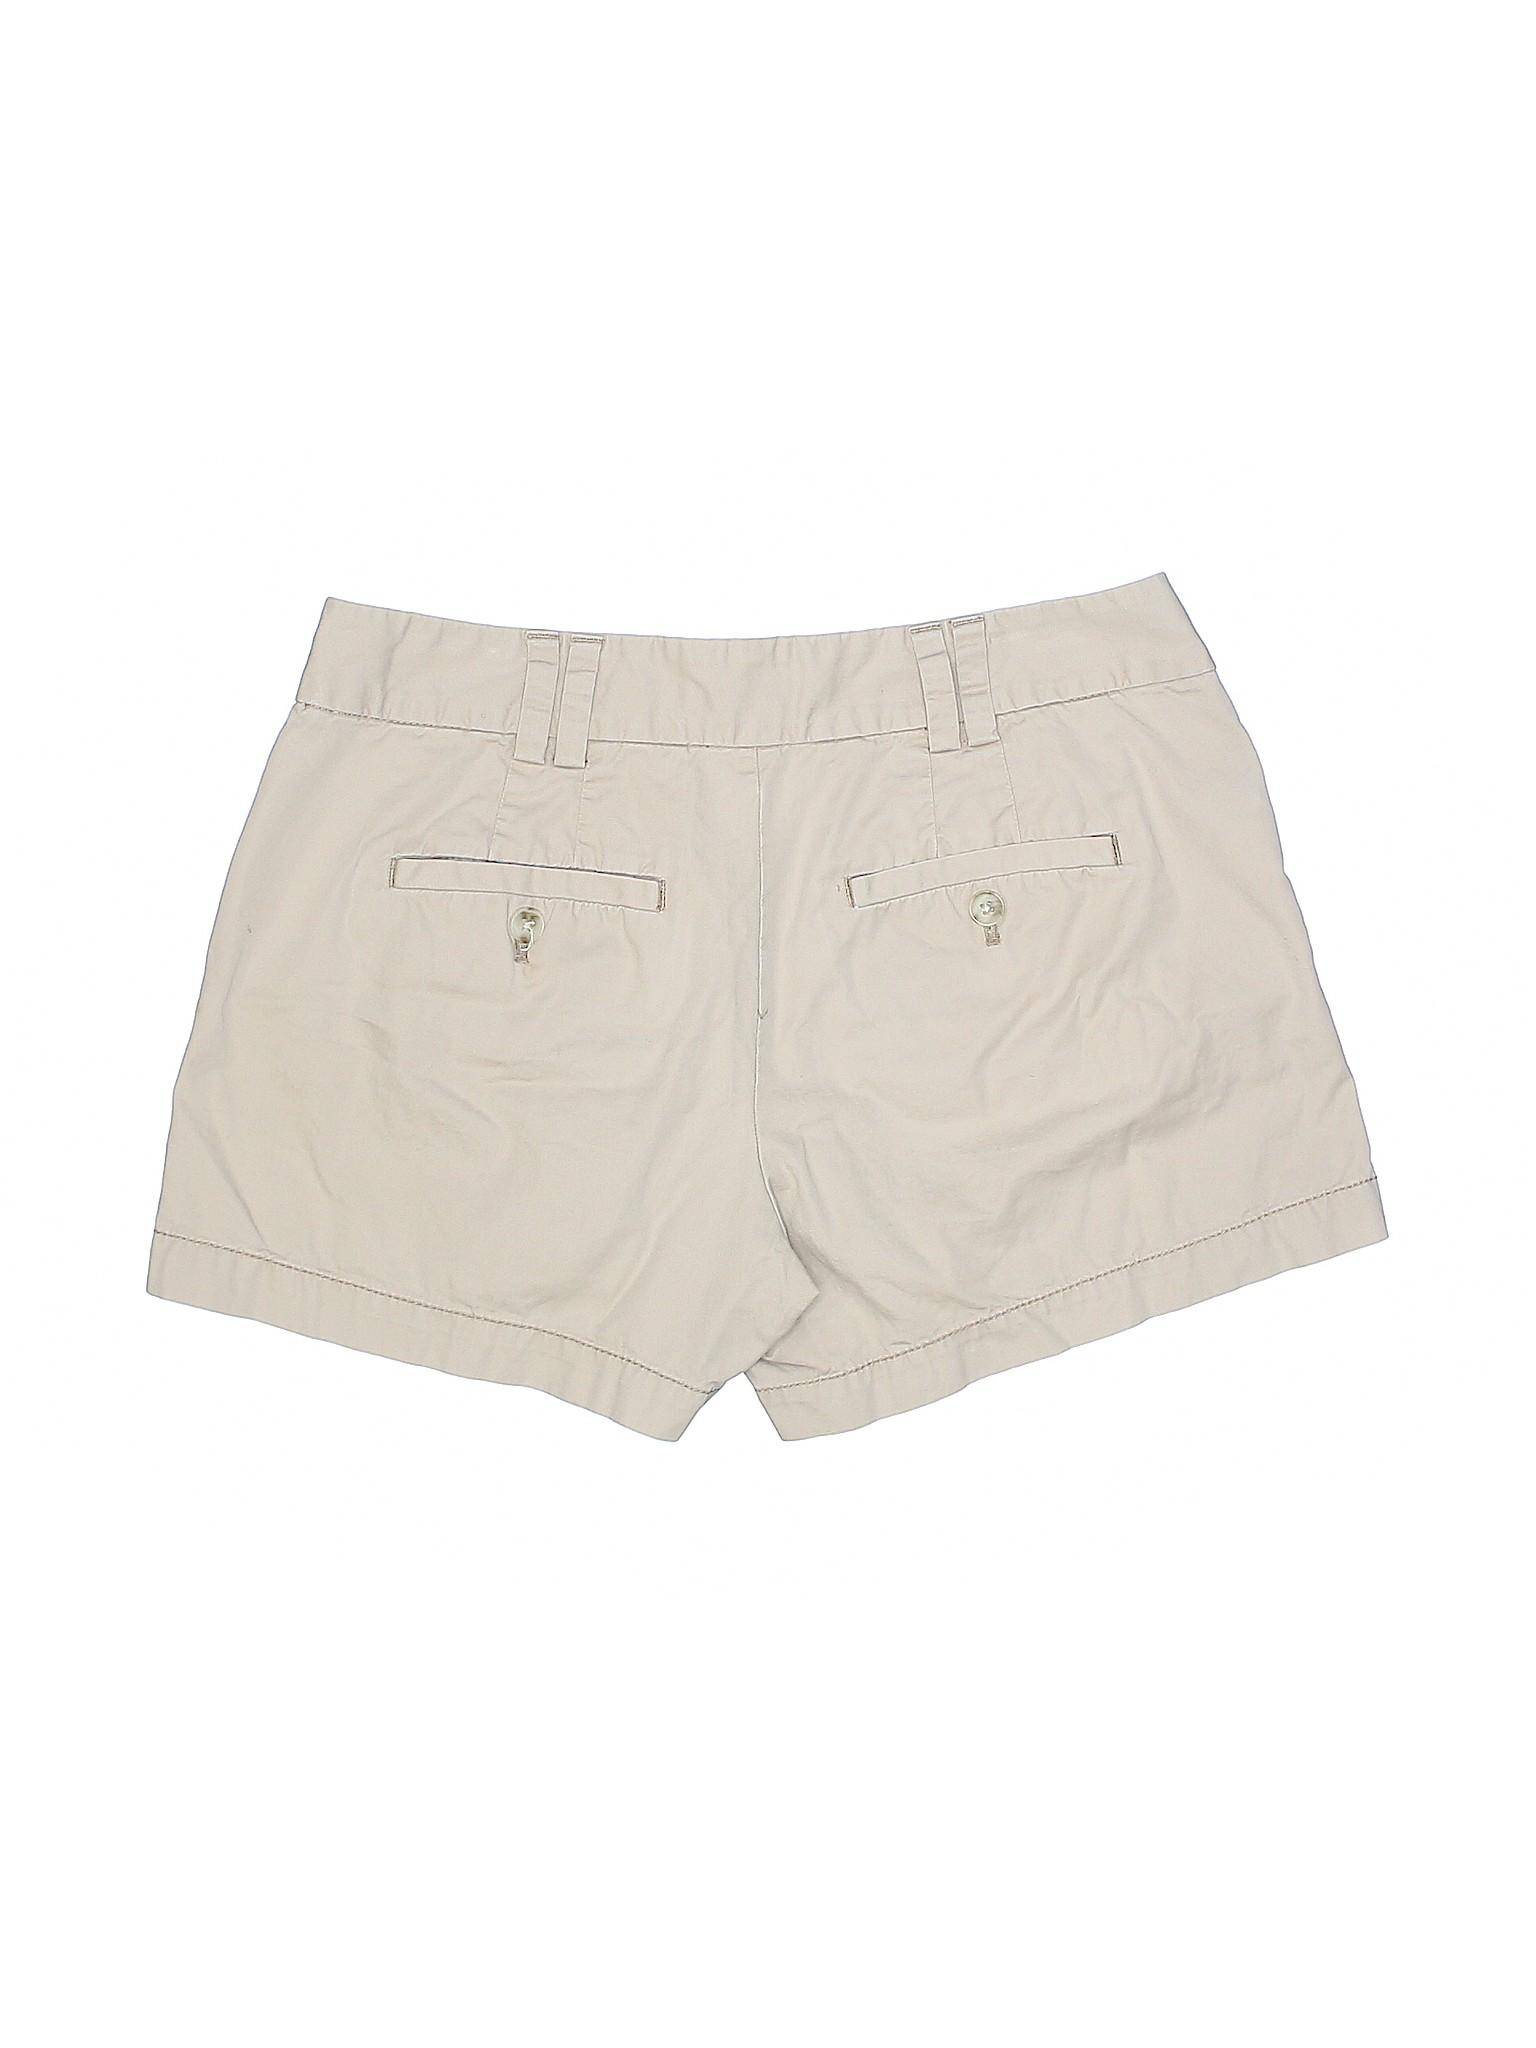 Khaki LOFT Ann Taylor Shorts Boutique Rq08xC